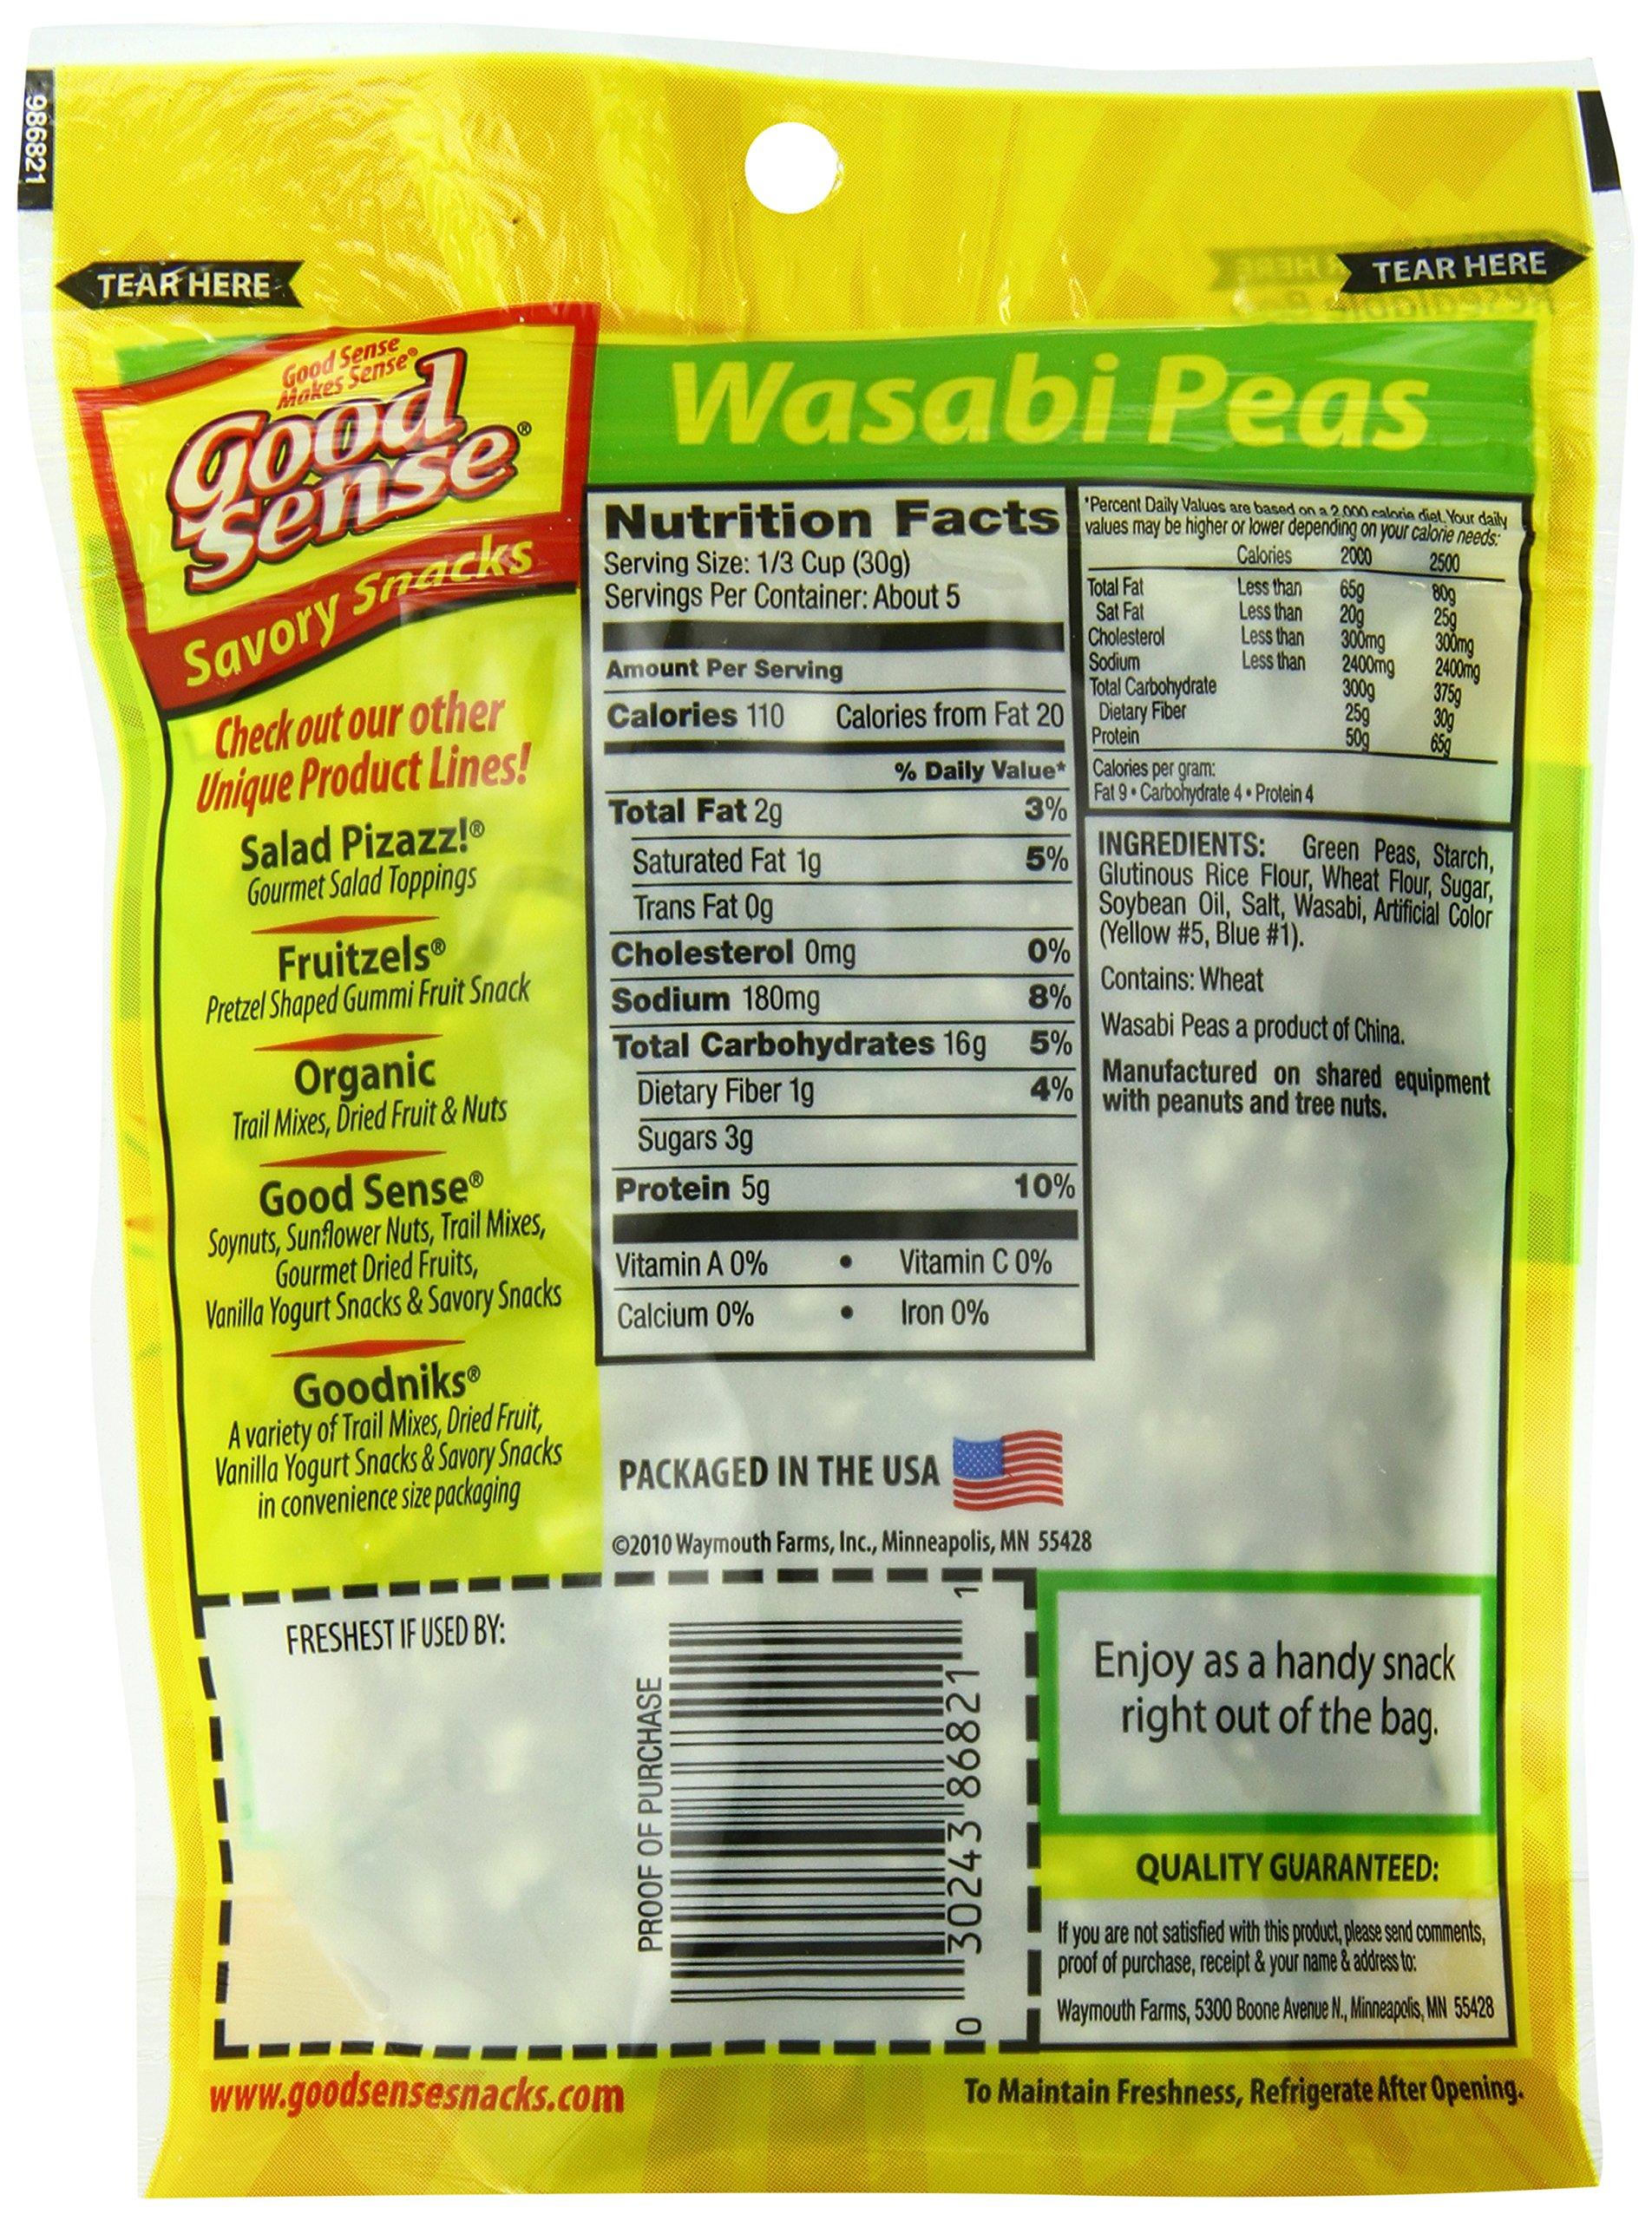 Good Sense Savory Snacks, Wasabi Peas, 5-Ounce Bags (Pack of 12) by Good Sense (Image #4)